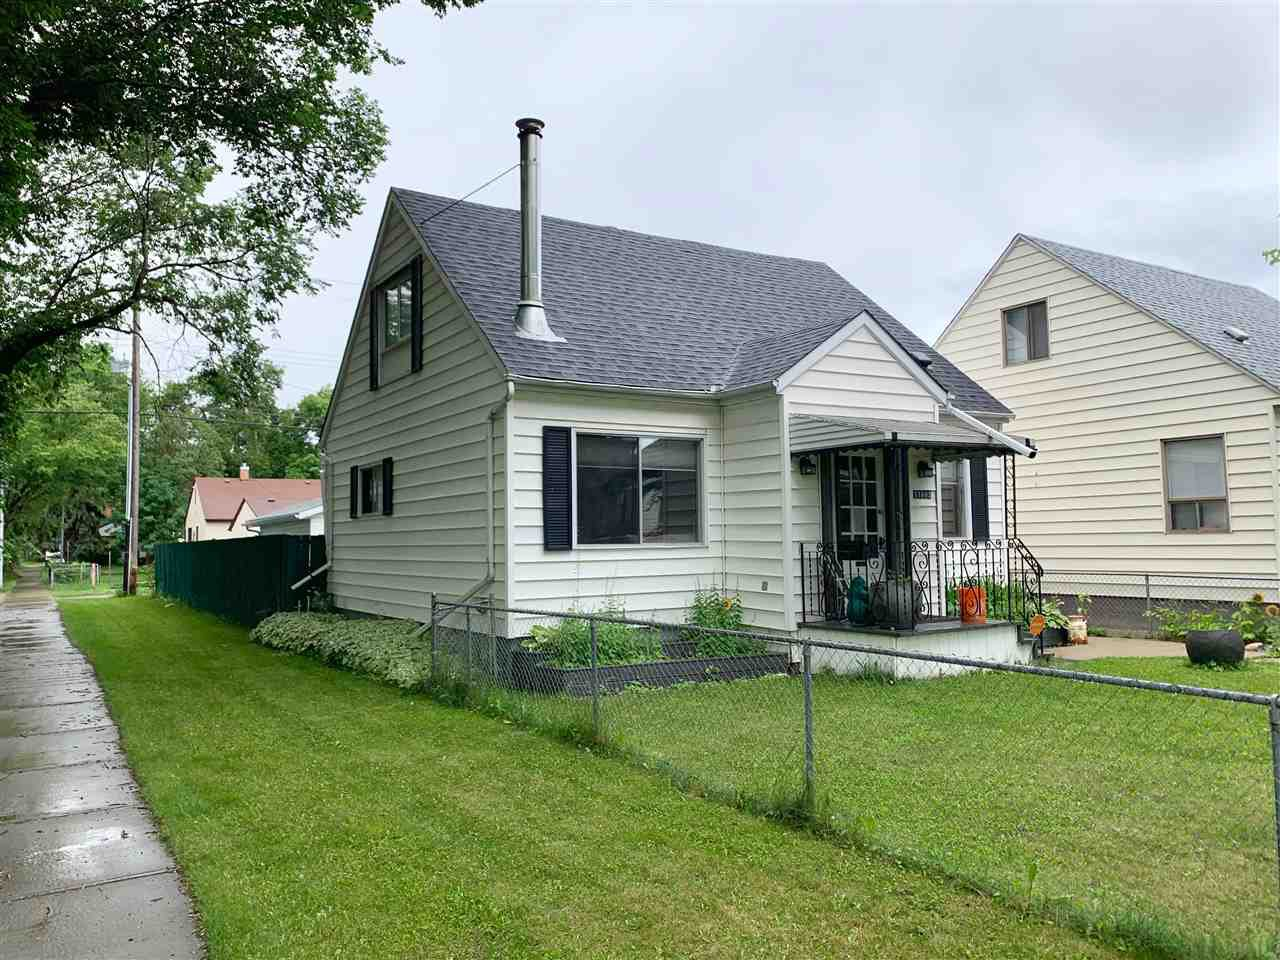 Main Photo: 11602 88 Street in Edmonton: Zone 05 House for sale : MLS®# E4164492